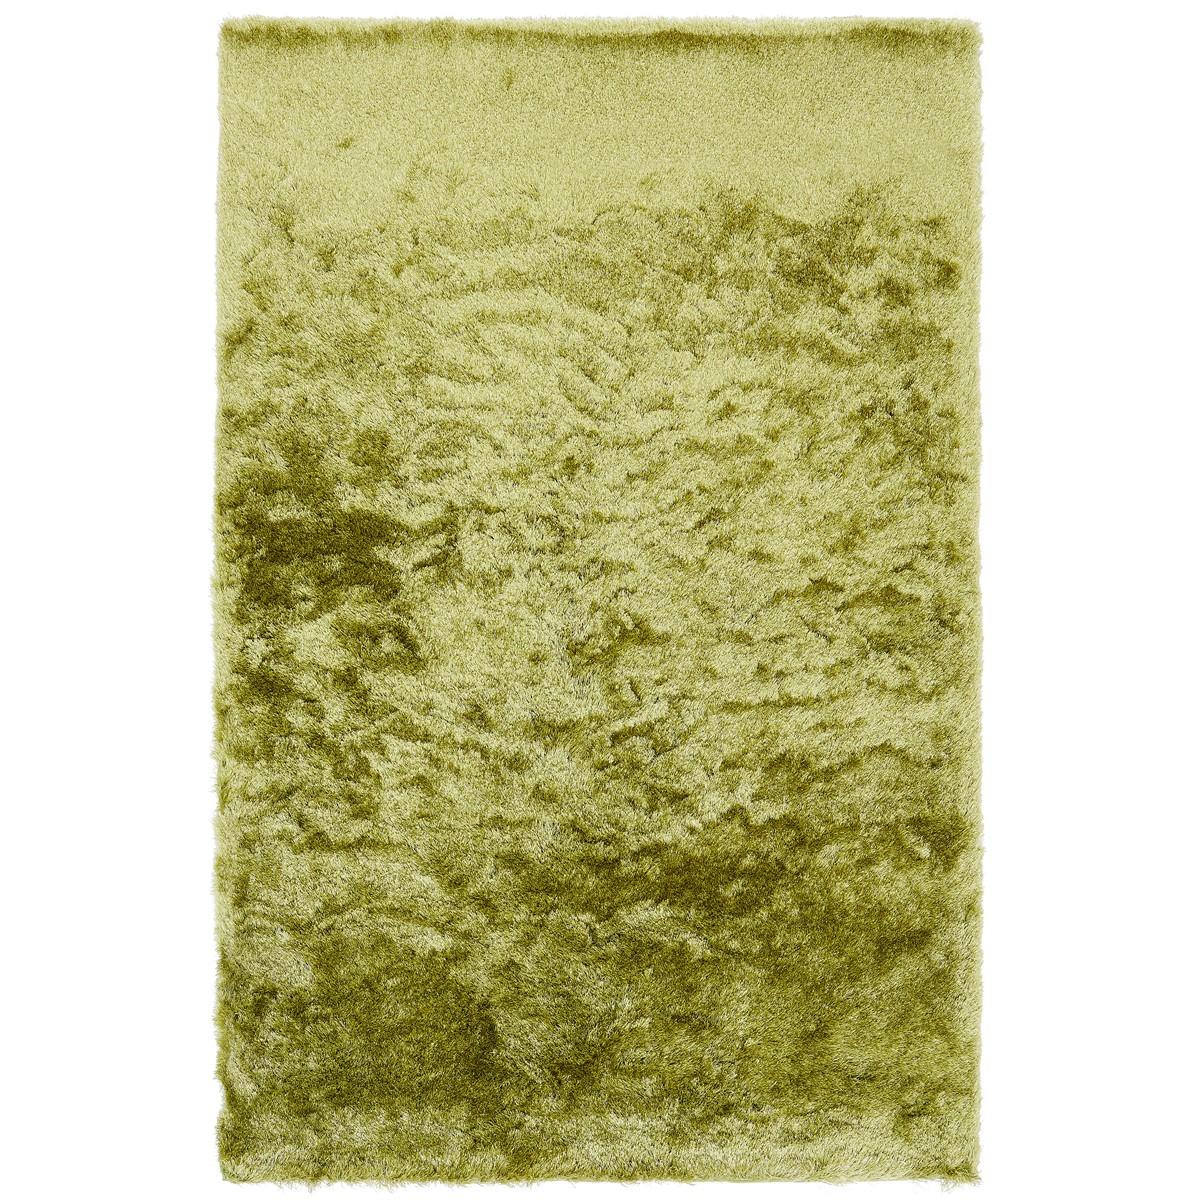 Tapis shaggy doux en Polyester Vert clair 200x300 cm